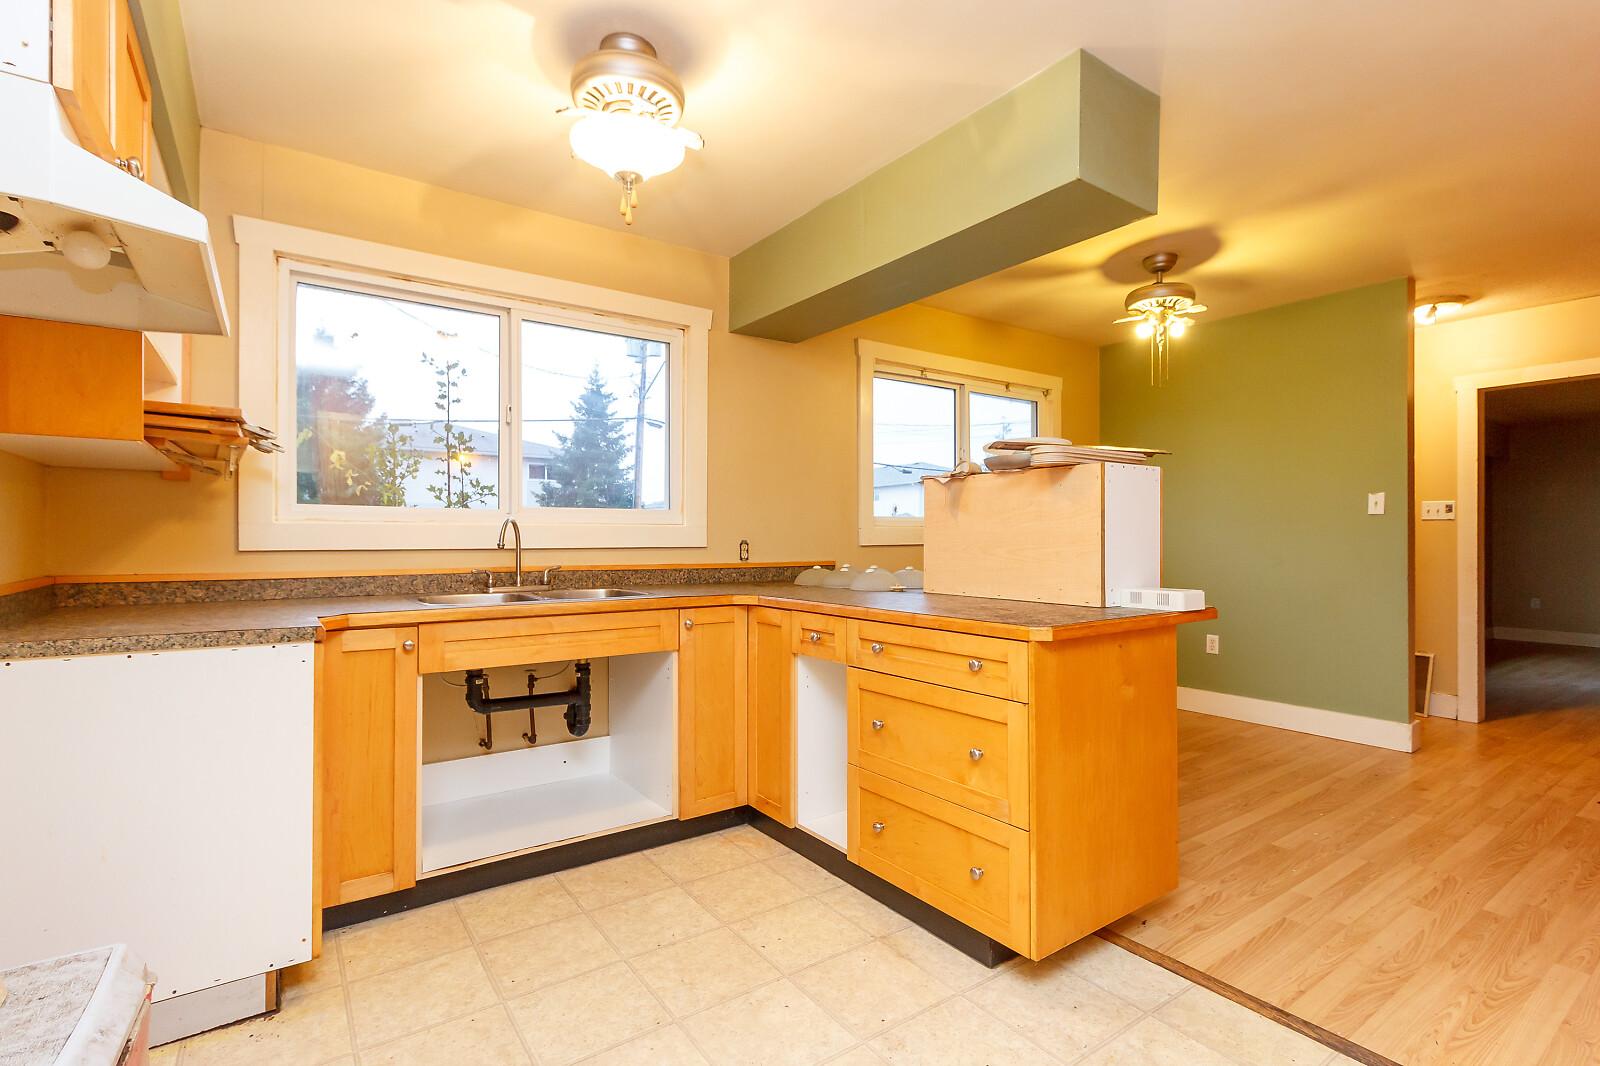 2519 Lewis St, Duncan, British Columbia  V9L 2Z2 - Photo 10 - 861929